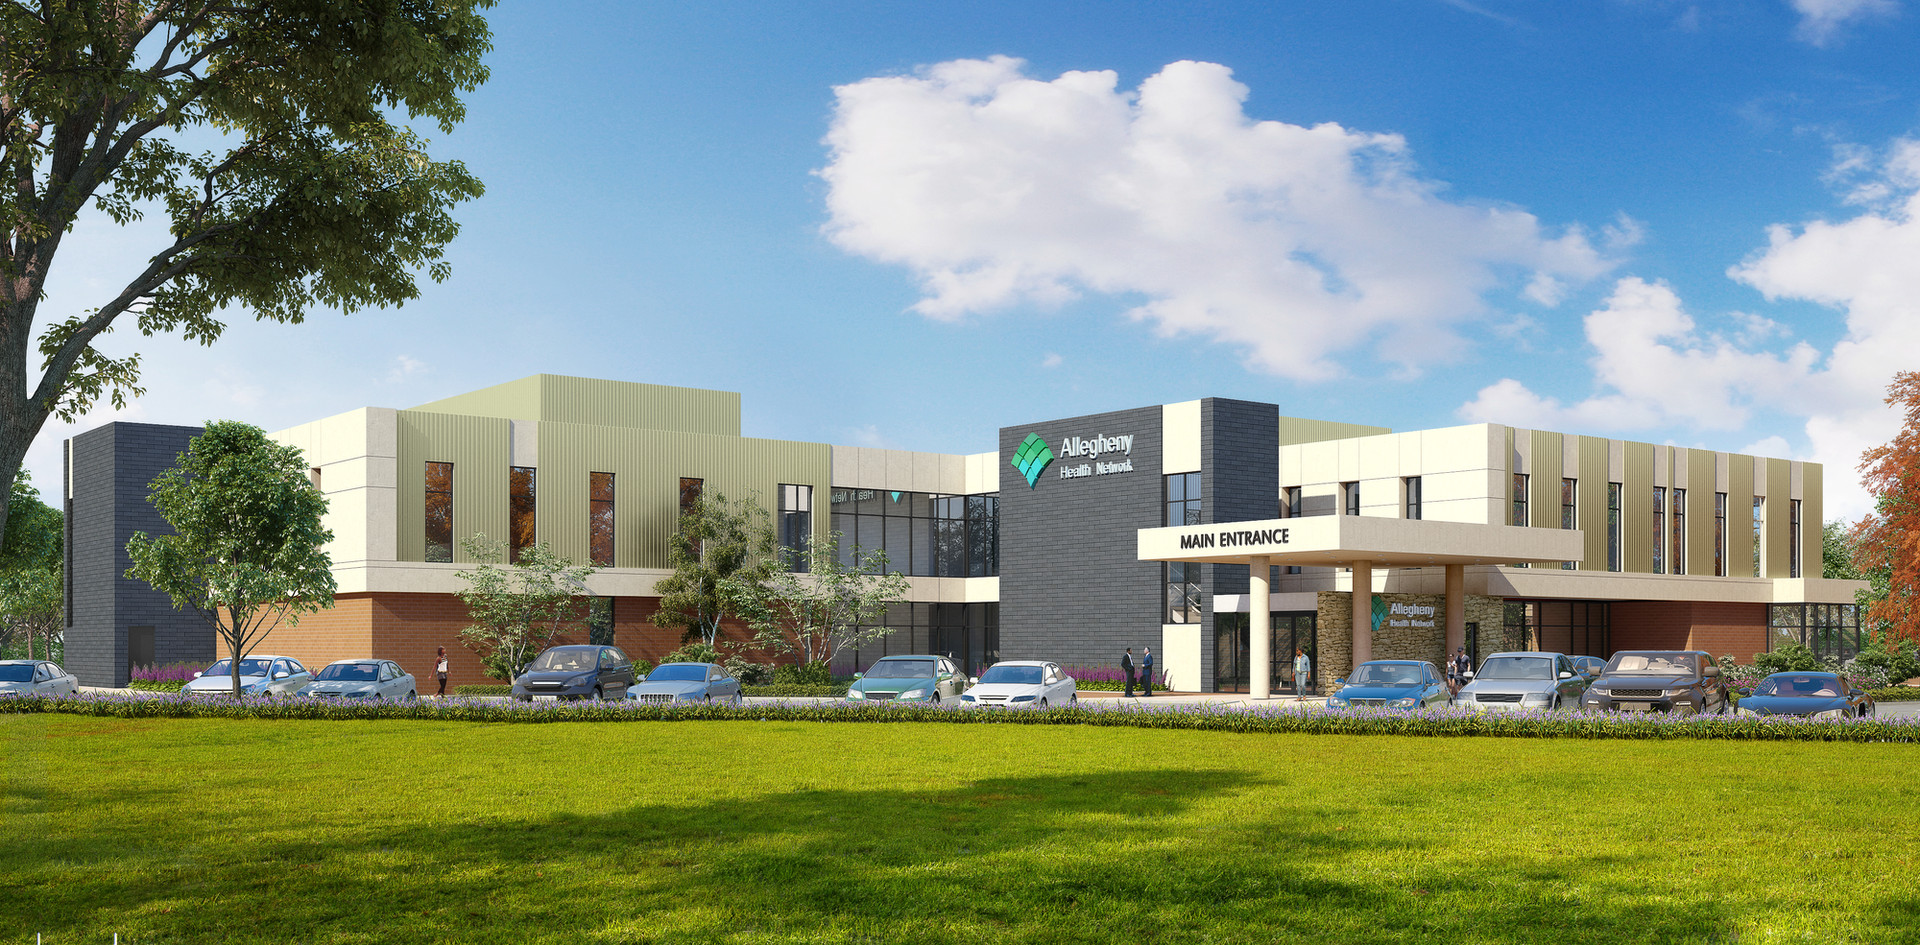 Allegheny Health Network Cancer Institute